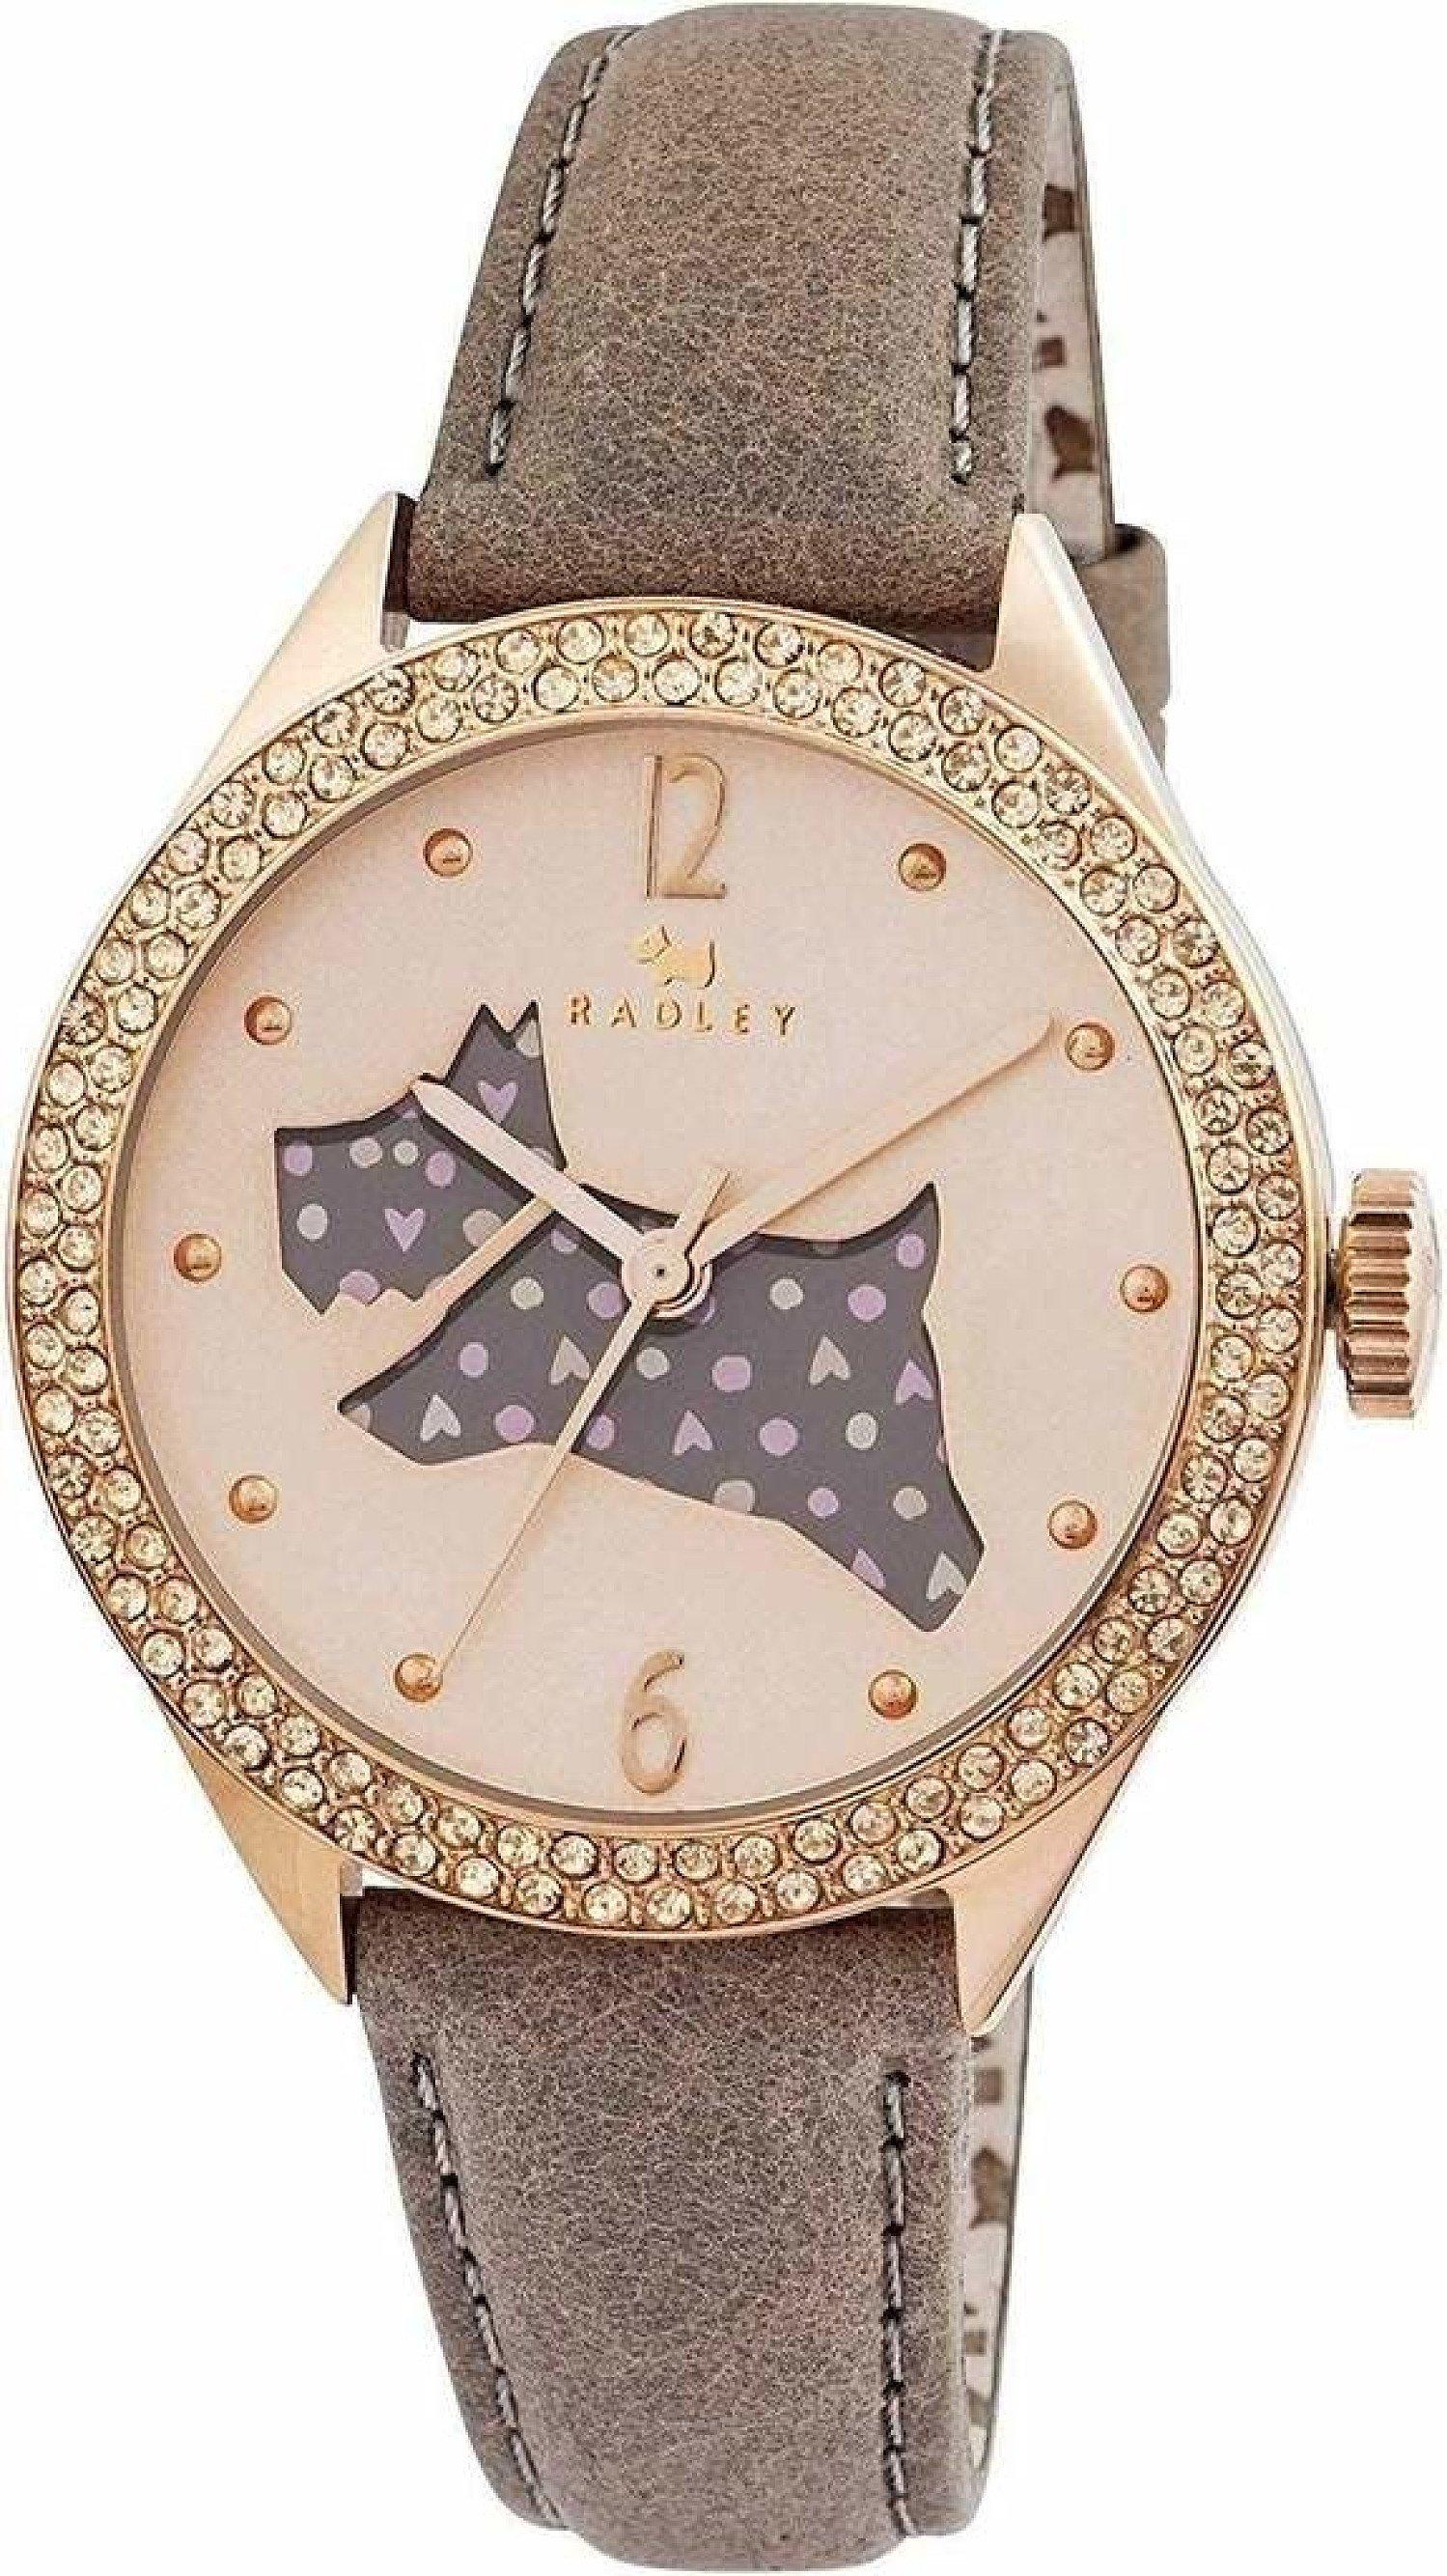 Radley RY2206 – Watch, Leather Strap Brown